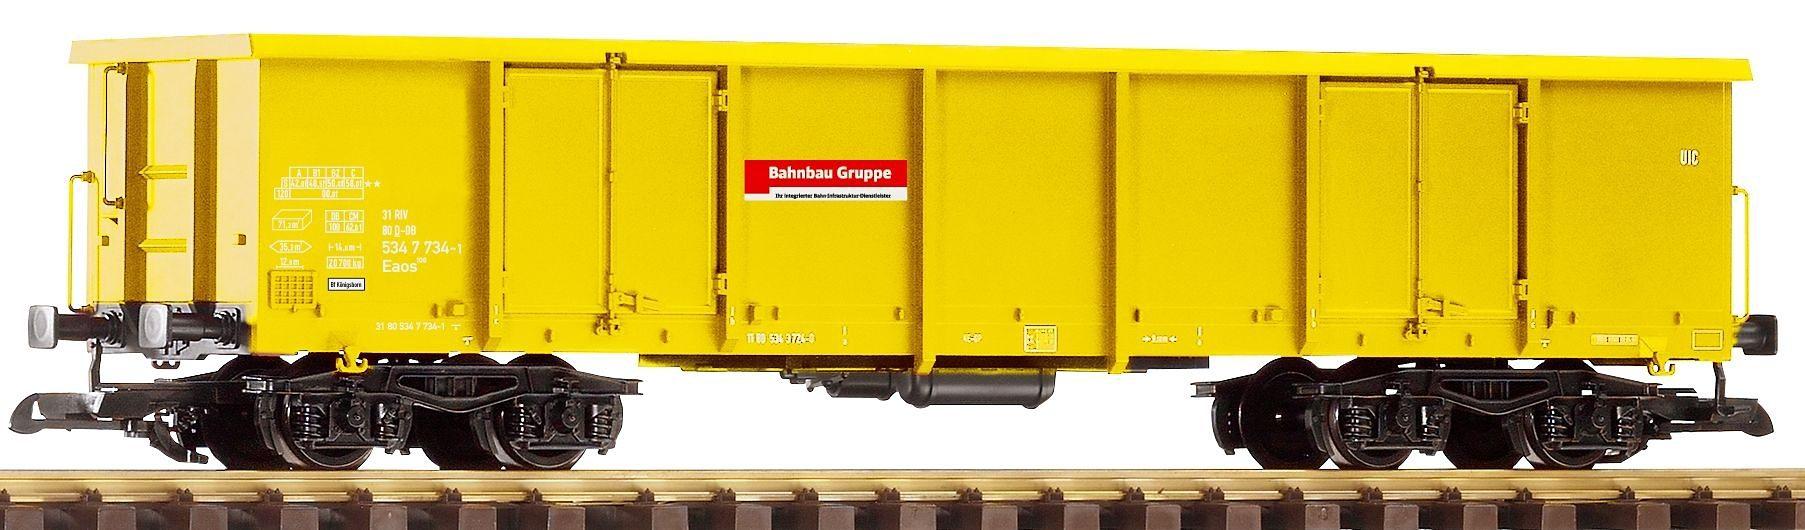 PIKO Güterwagen, Spur G, »Offener Drehgestellwagen Eaos, Bahnbaugruppe - Gleichstrom«